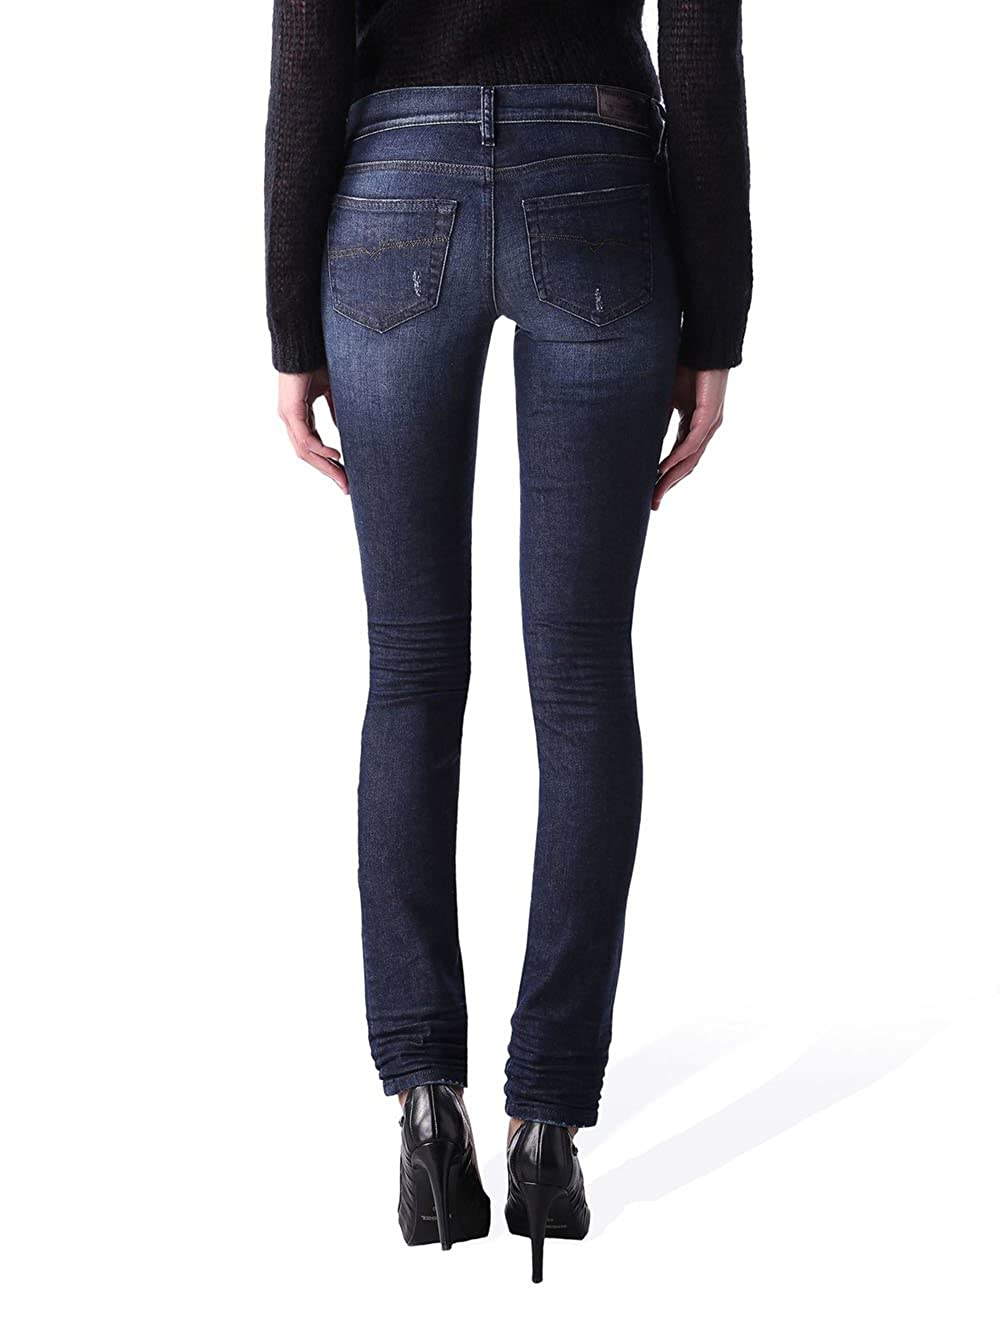 13896be37a Diesel Sandy-B Patch 0851X Stretch Women s Jeans Pants Slim Bootcut   Amazon.co.uk  Clothing